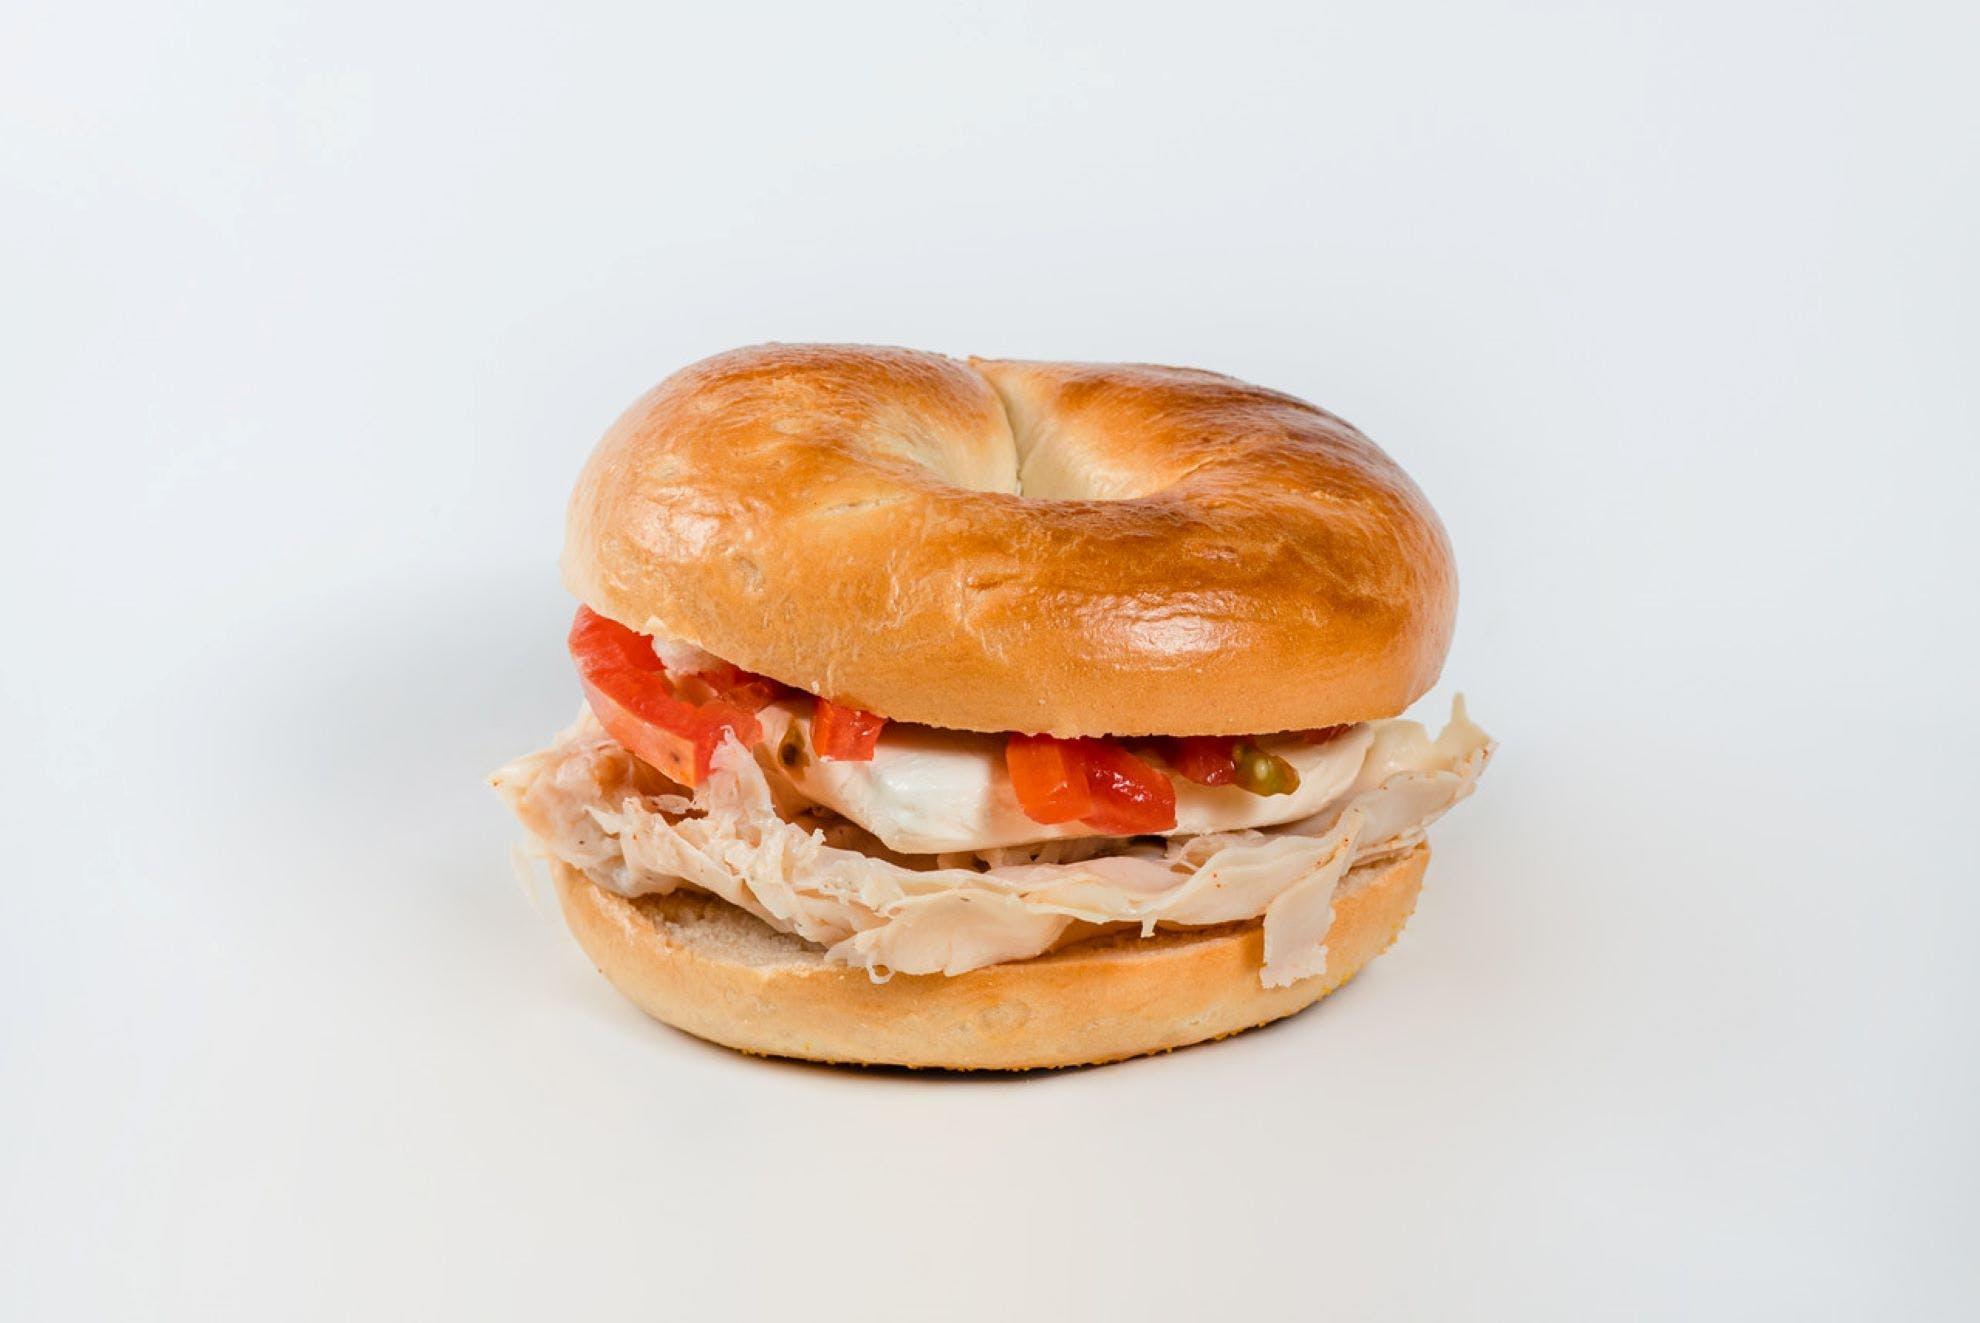 Skyline Bagel Sandwich from Gandolfo's New York Deli - American Fork in American Fork, UT